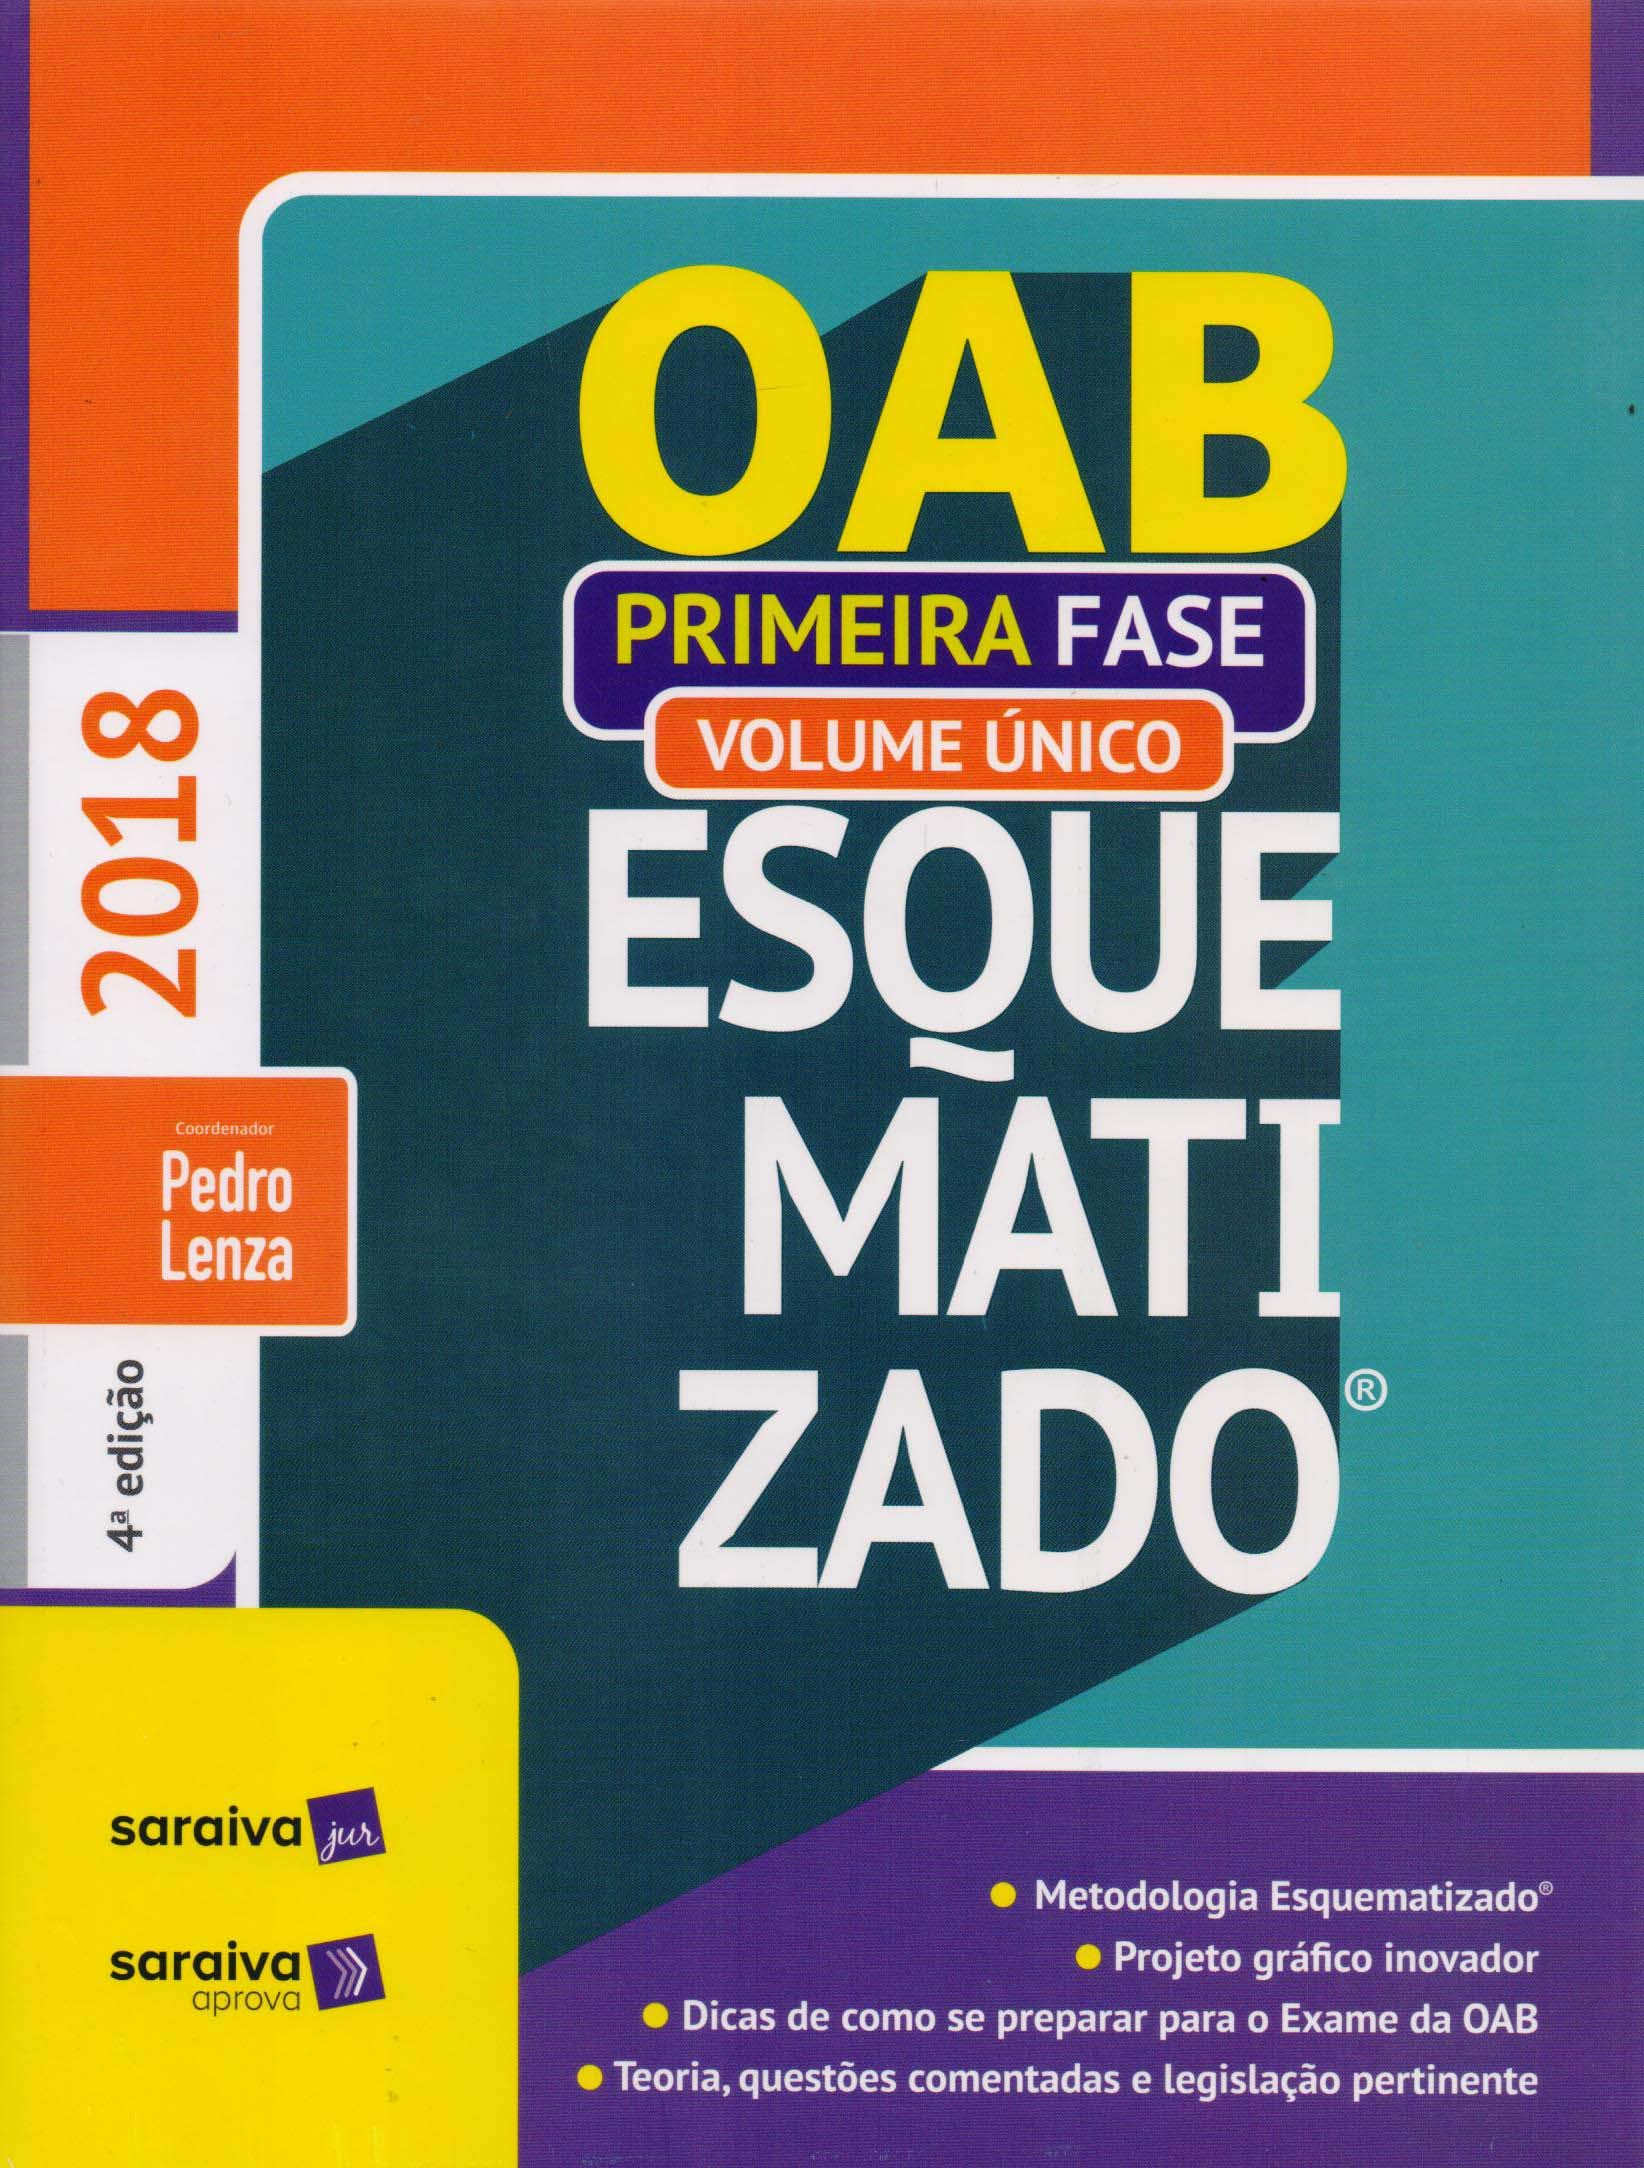 Oab Esquematizado. 1ª Fase - Volume Único - 9788553601776 - Livros na  Amazon Brasil b04715e0b0